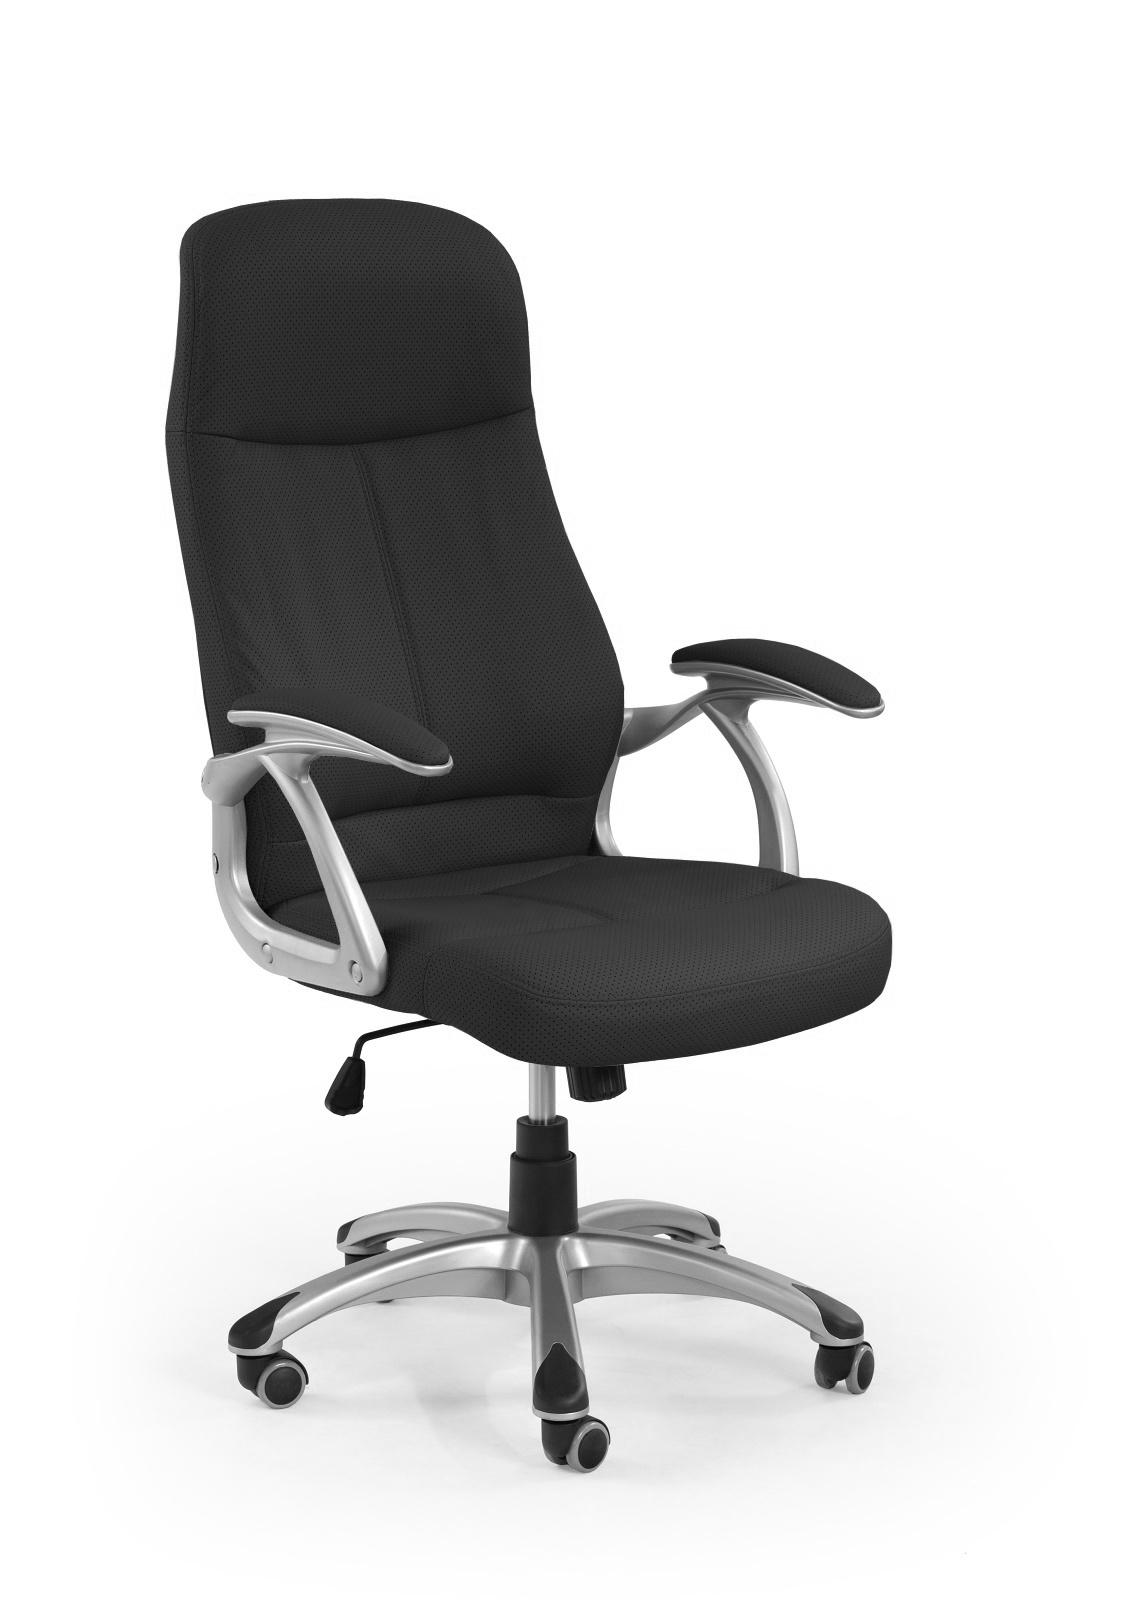 Kancelárske kreslo - Halmar - Edison čierna